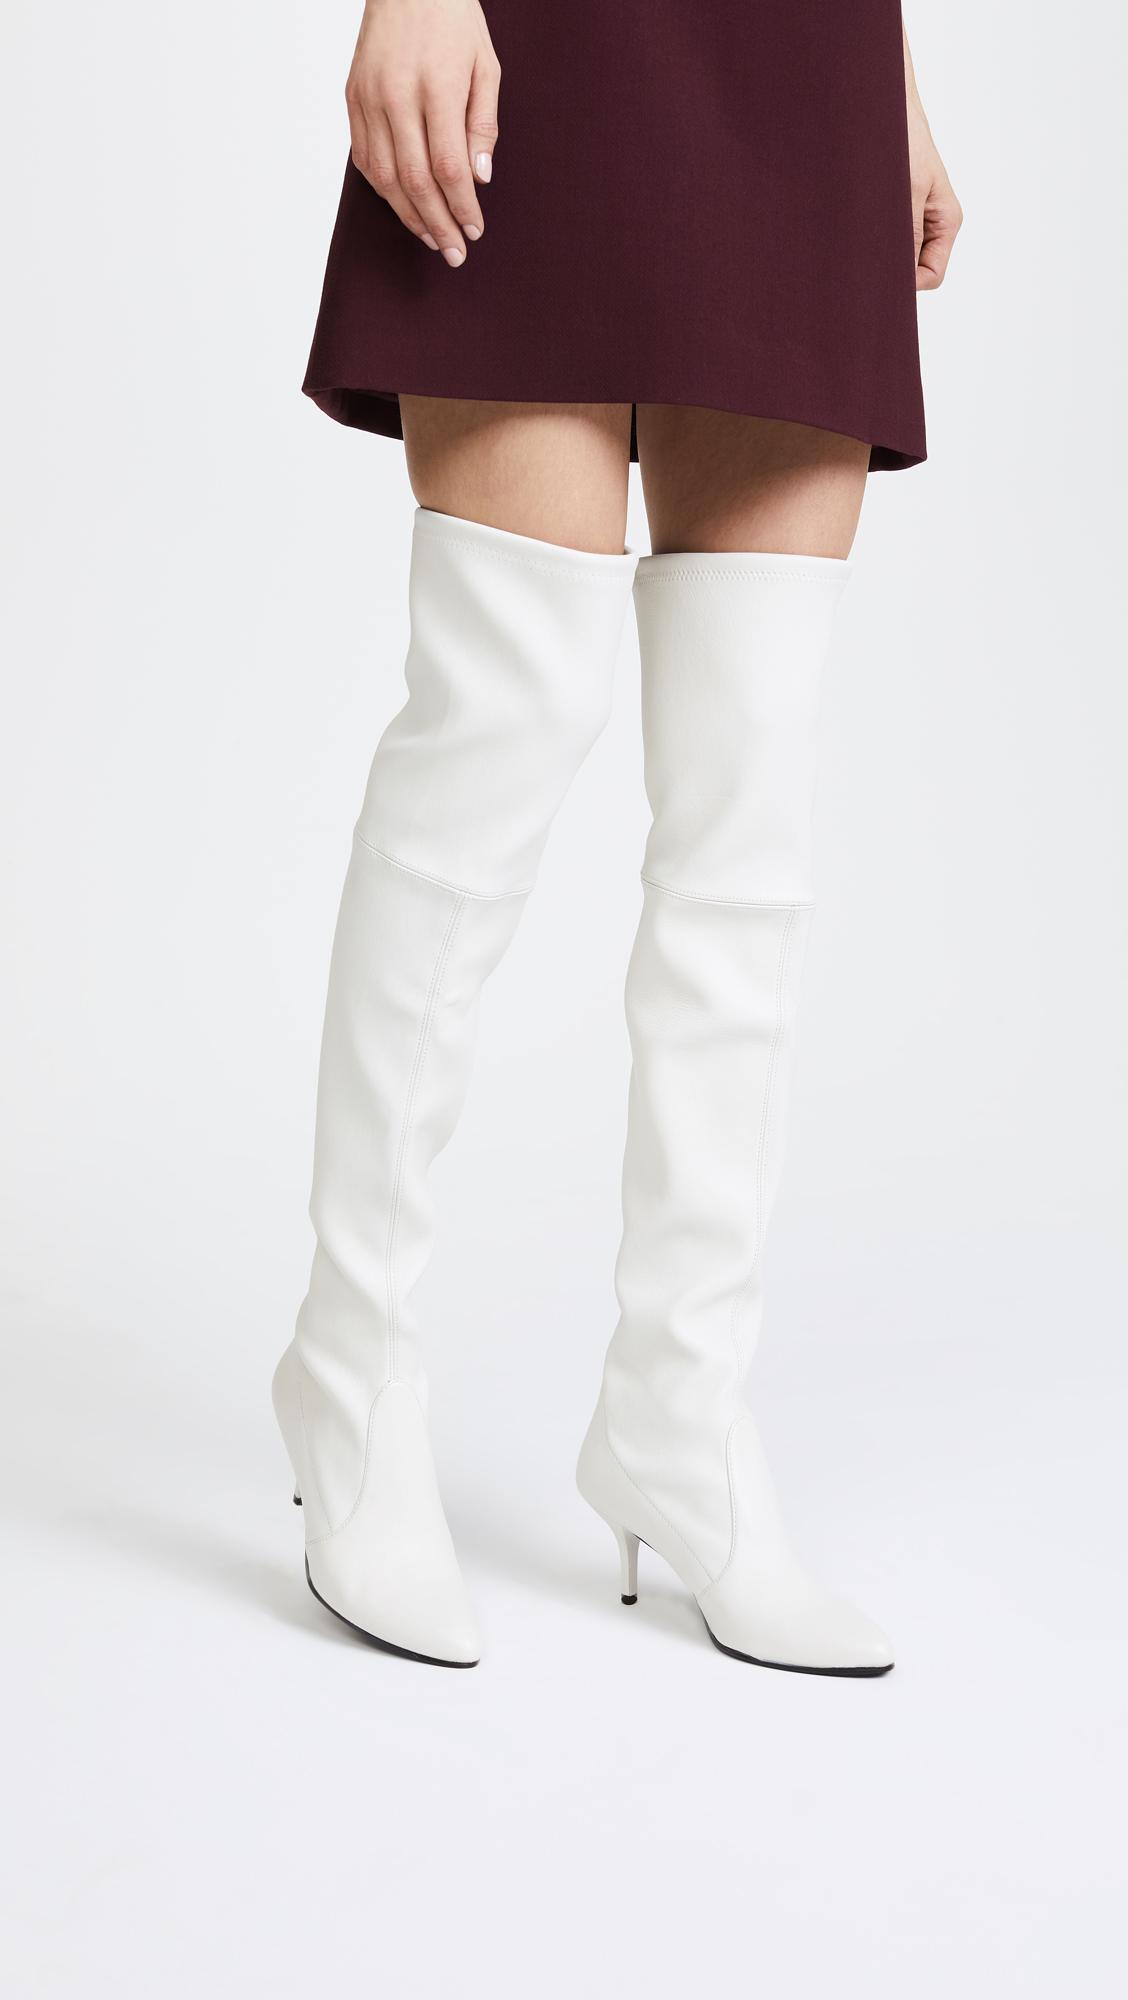 0e88f1825 Stuart Weitzman Tie Model Thigh High Boots | SHOPBOP